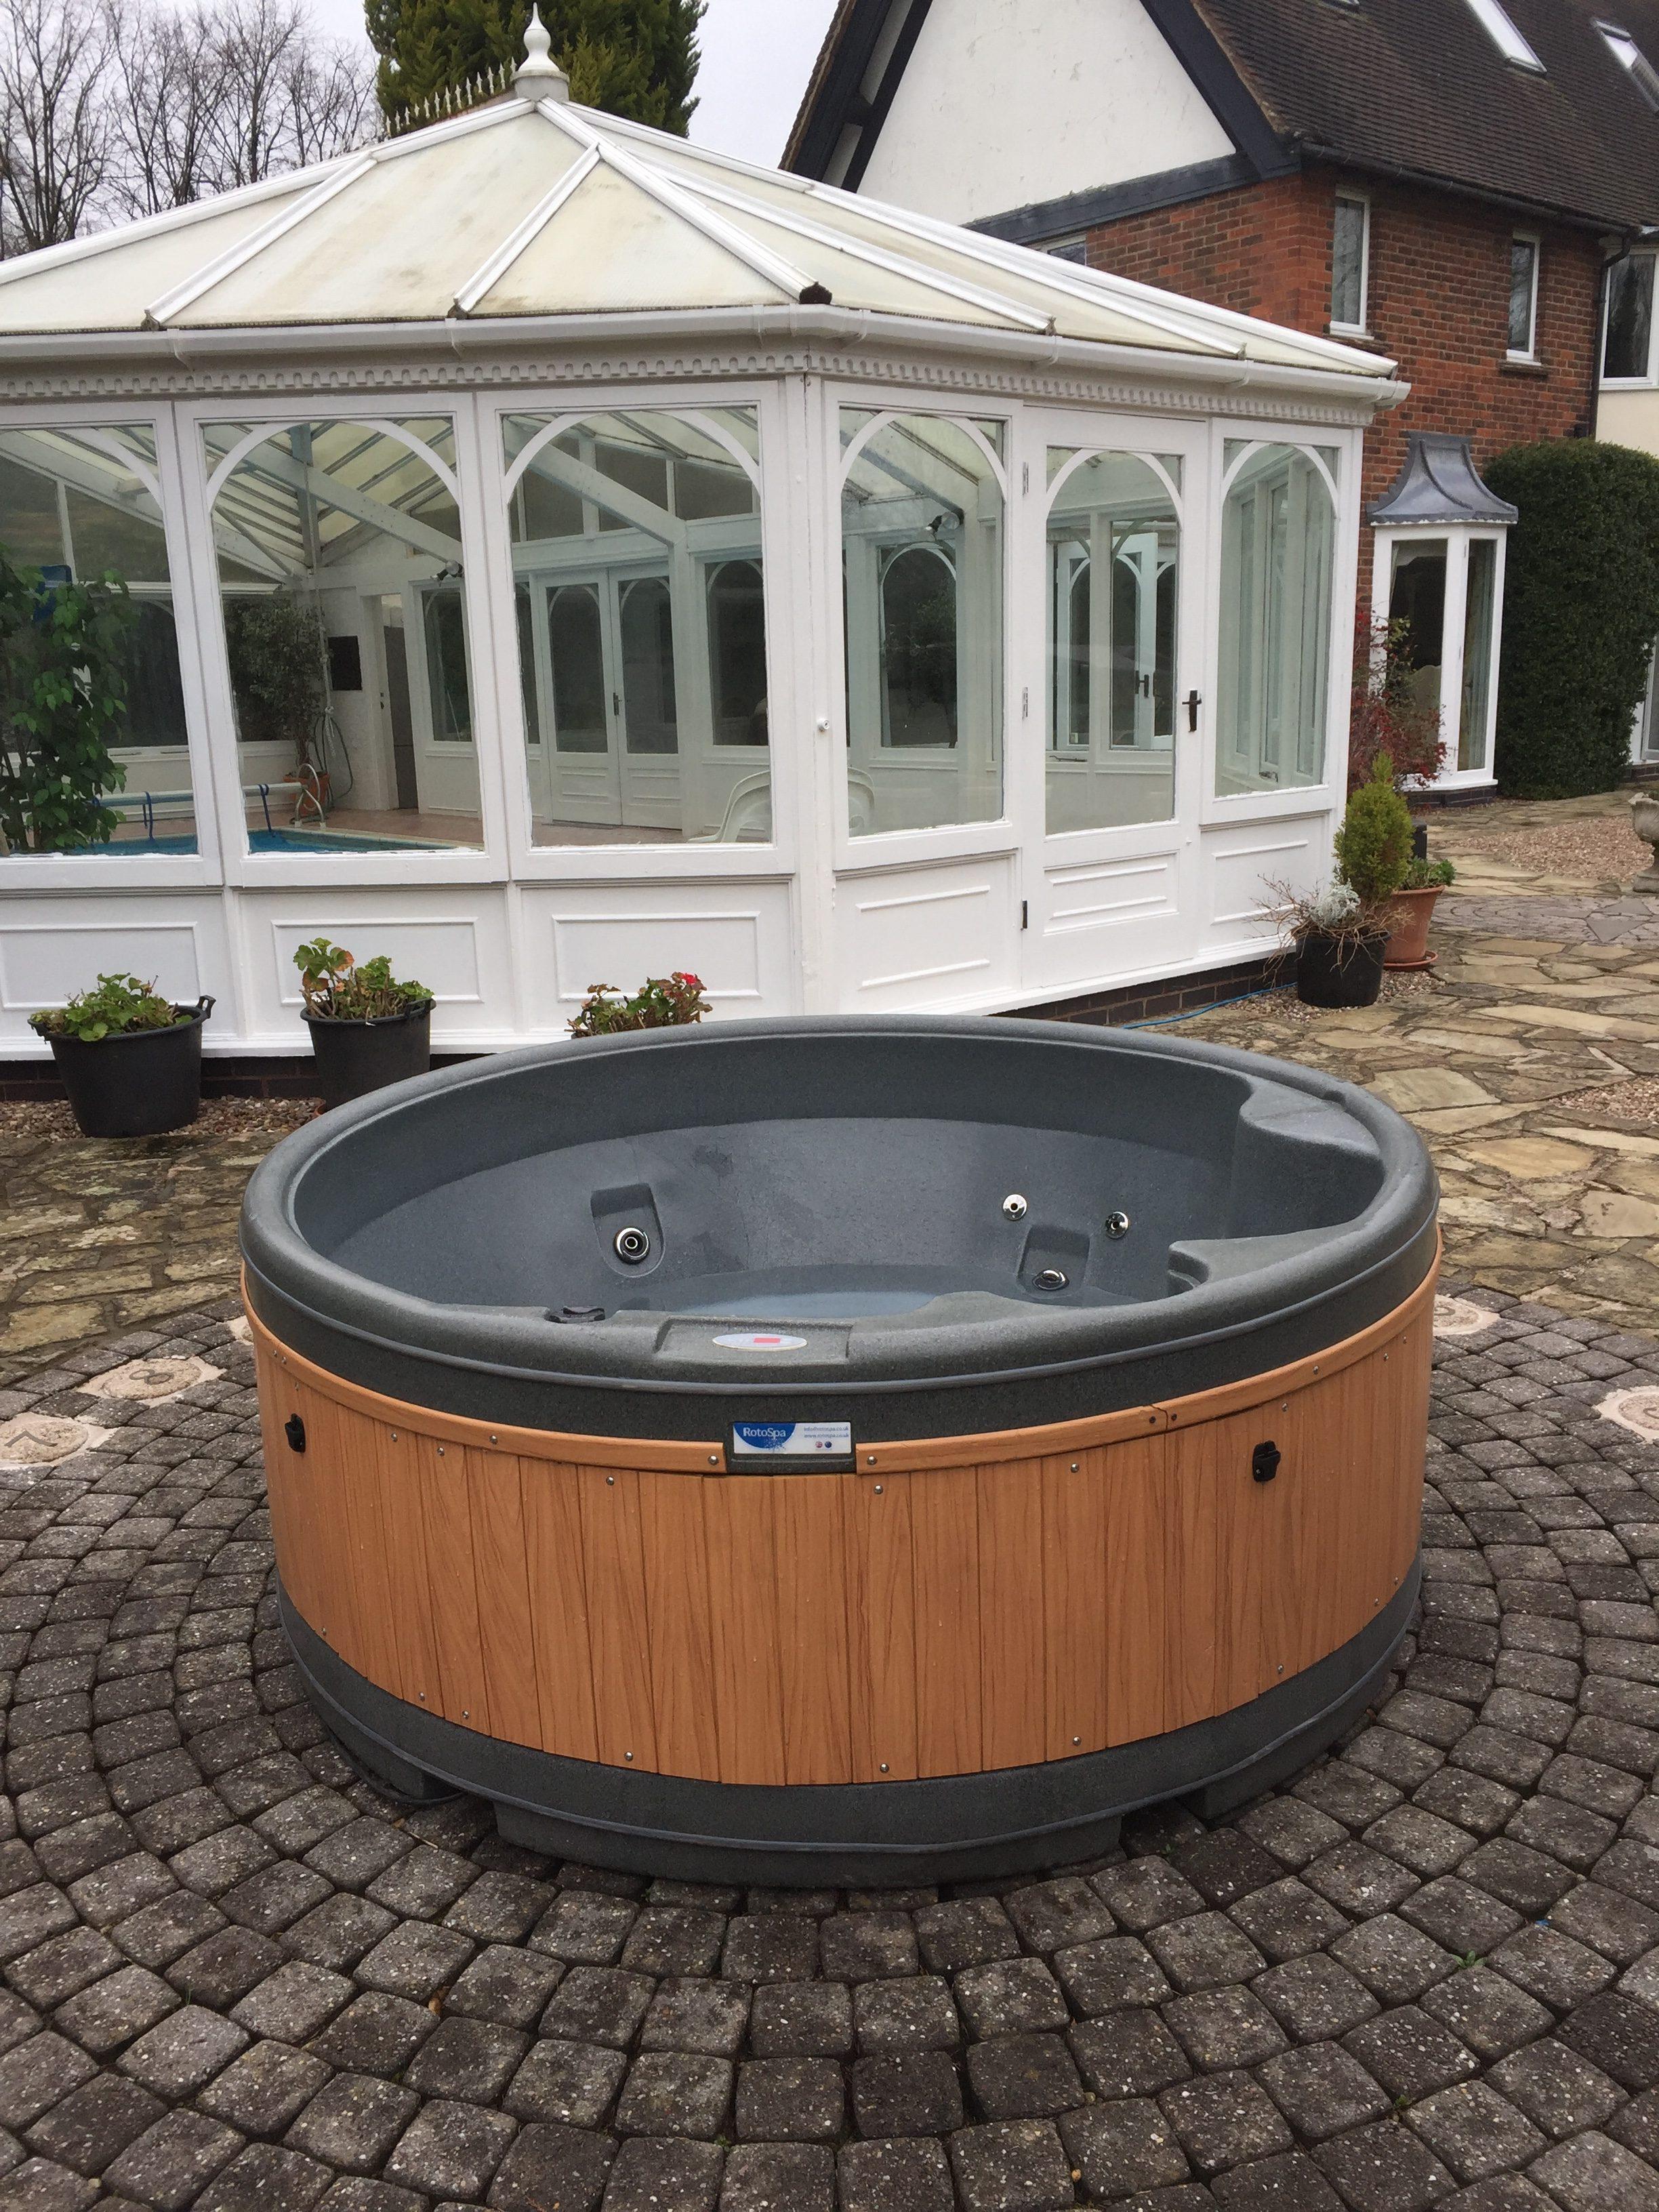 Arnold Hot Tub Hire, Cheap, Local Hot Tub Rental Arnold, Nottingham